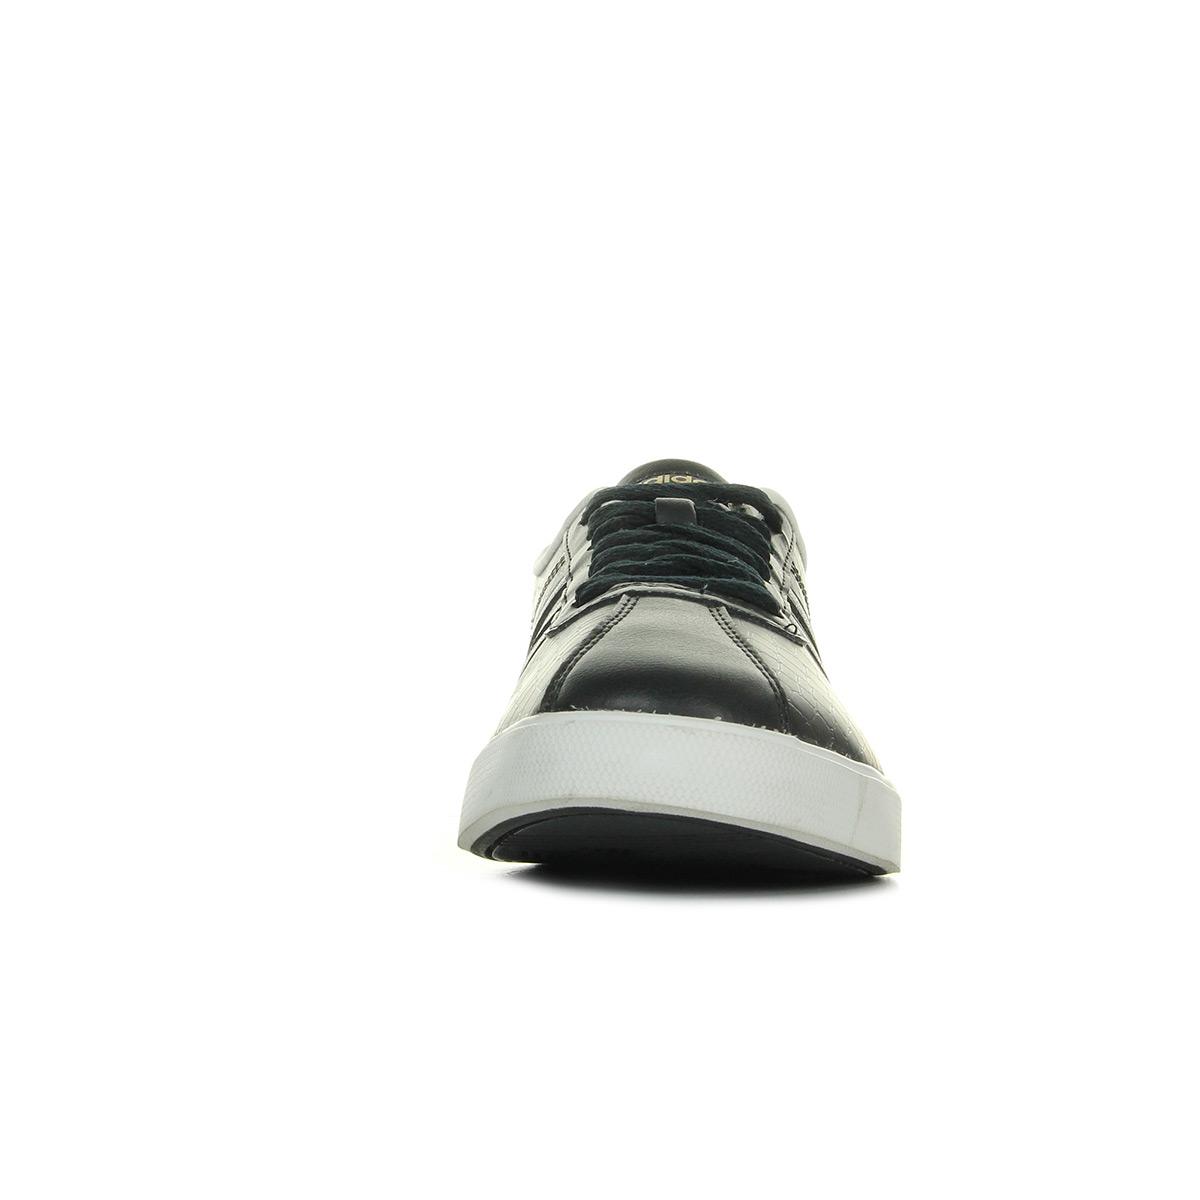 adidas Neo Courtset W AW5004, Baskets mode femme